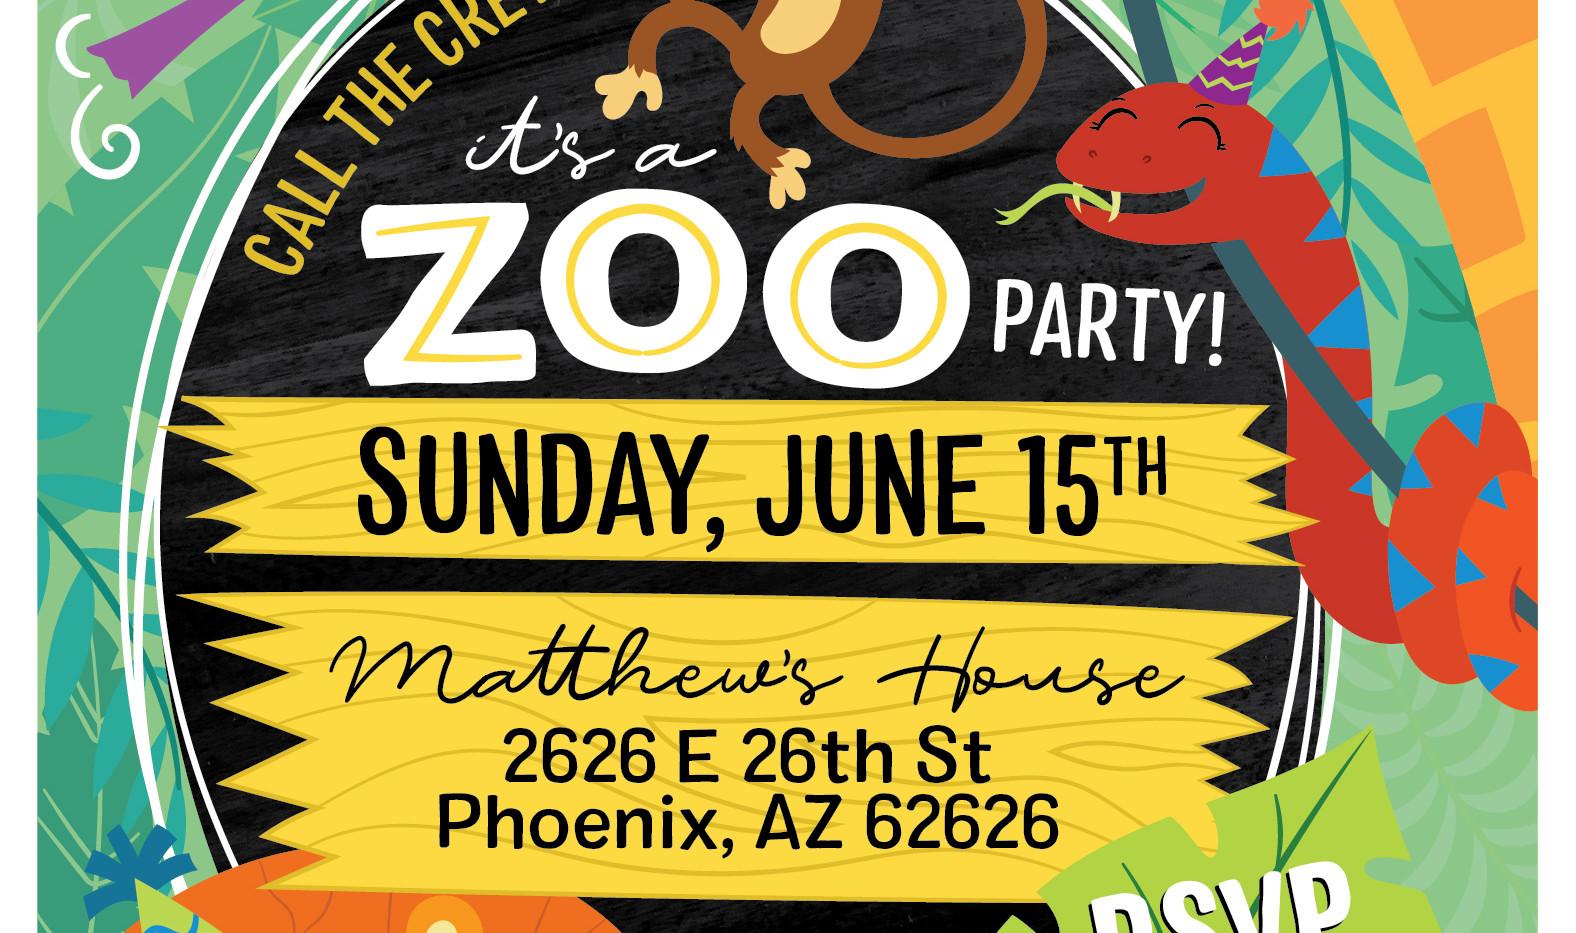 Children's Zoo Themed Birthday Party Invitation